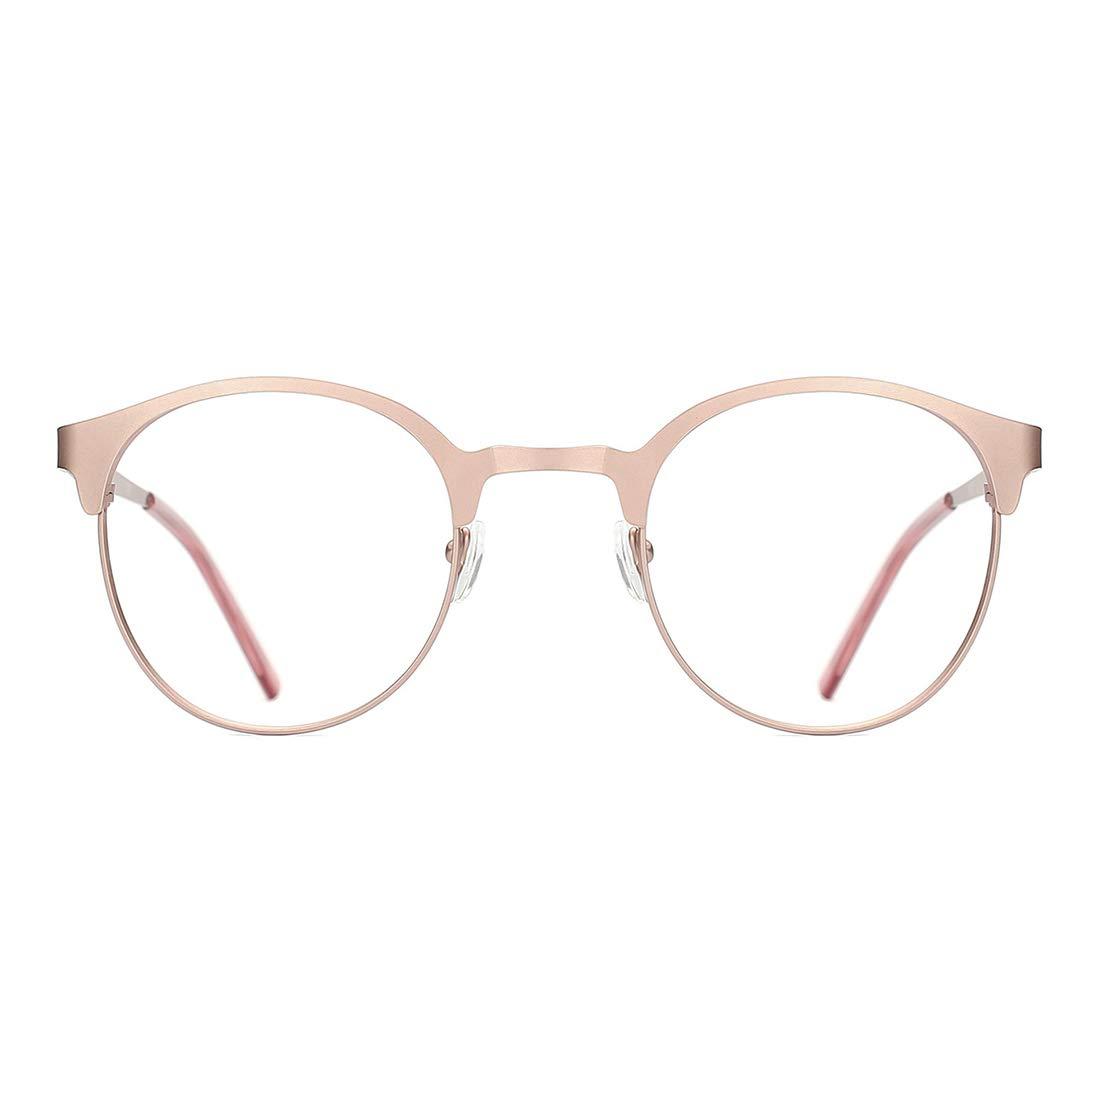 TIJN New Round Designer Metal Eyeglasses Frames with Clear Lens 000011501